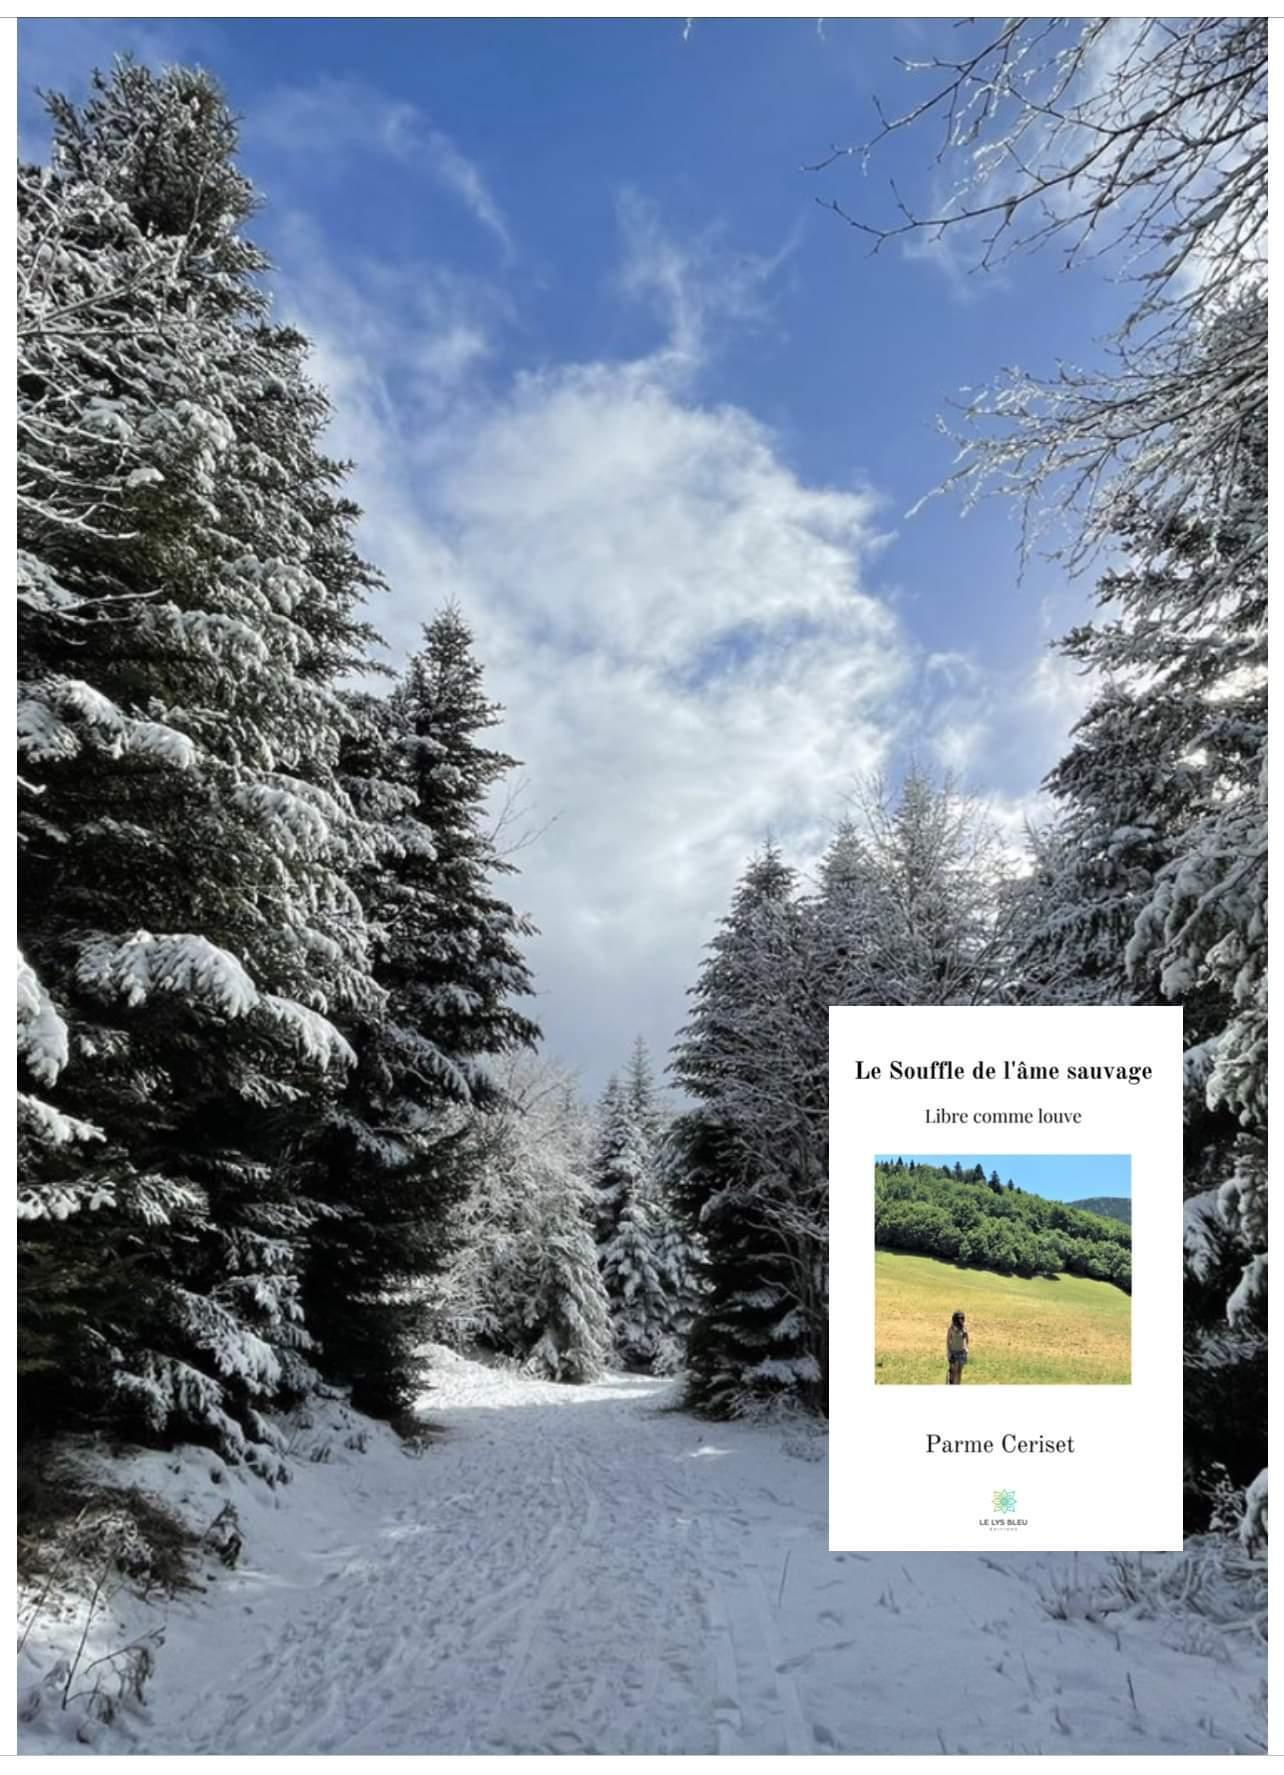 Image recueil dans paysage enneige